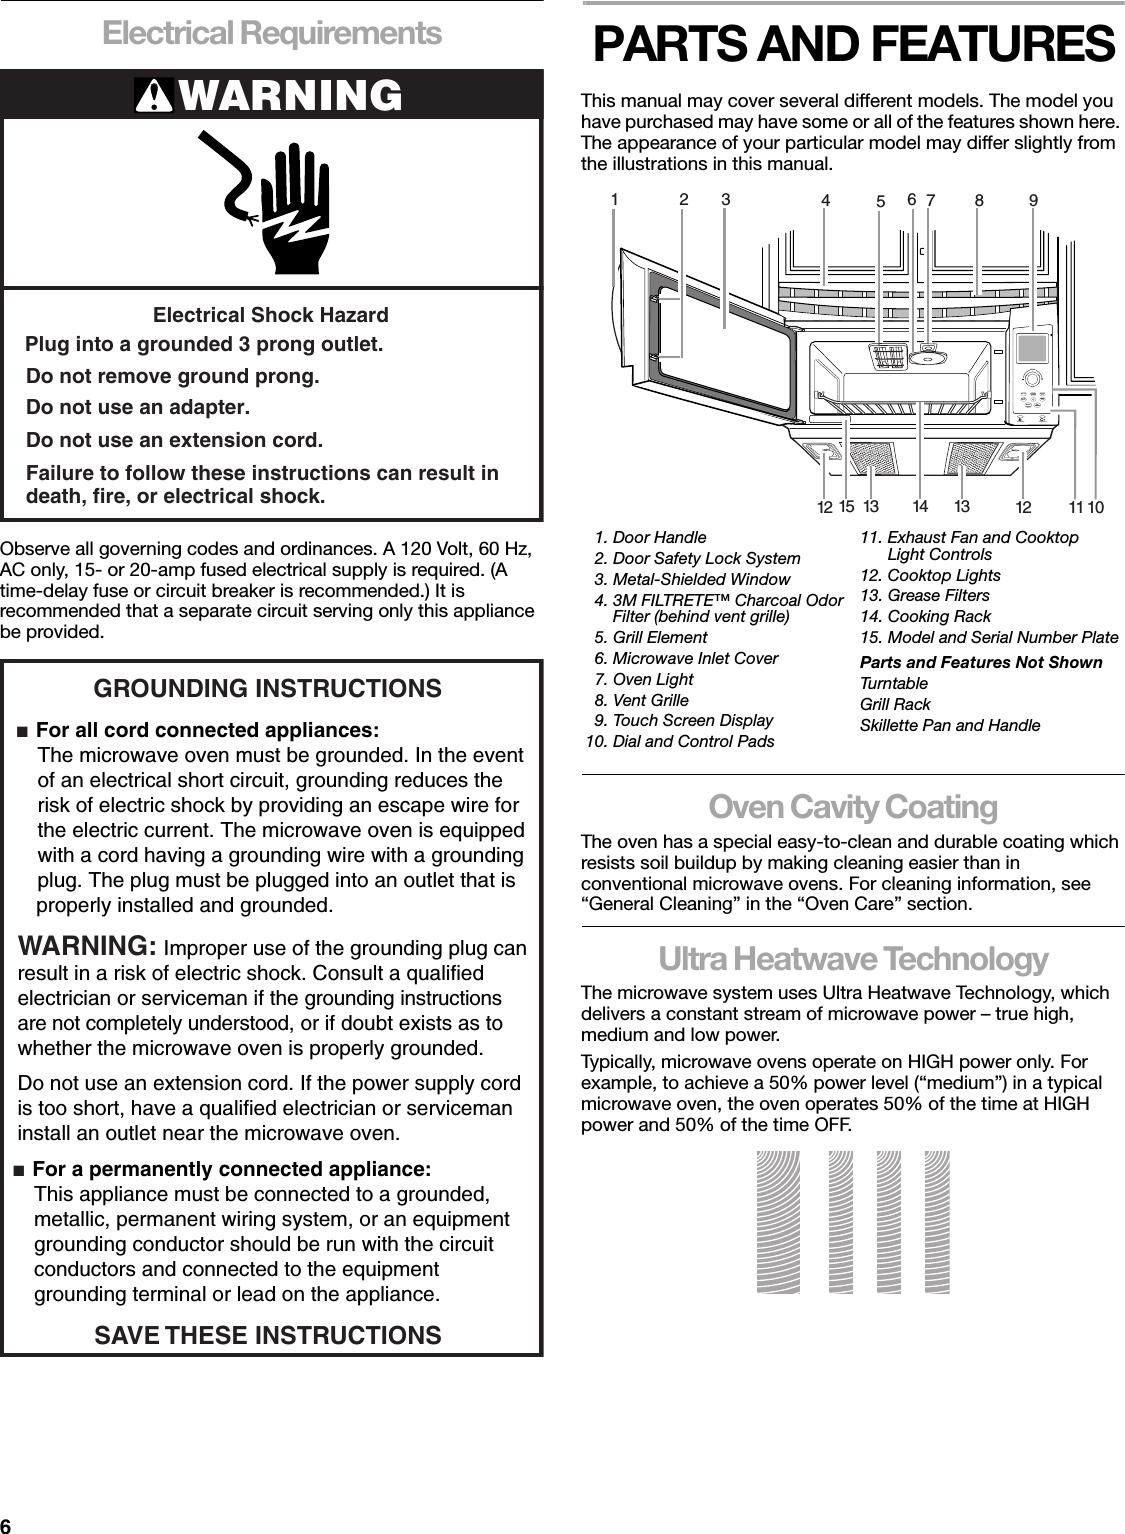 U00bb Saving Some Green Part 1 Manual Guide